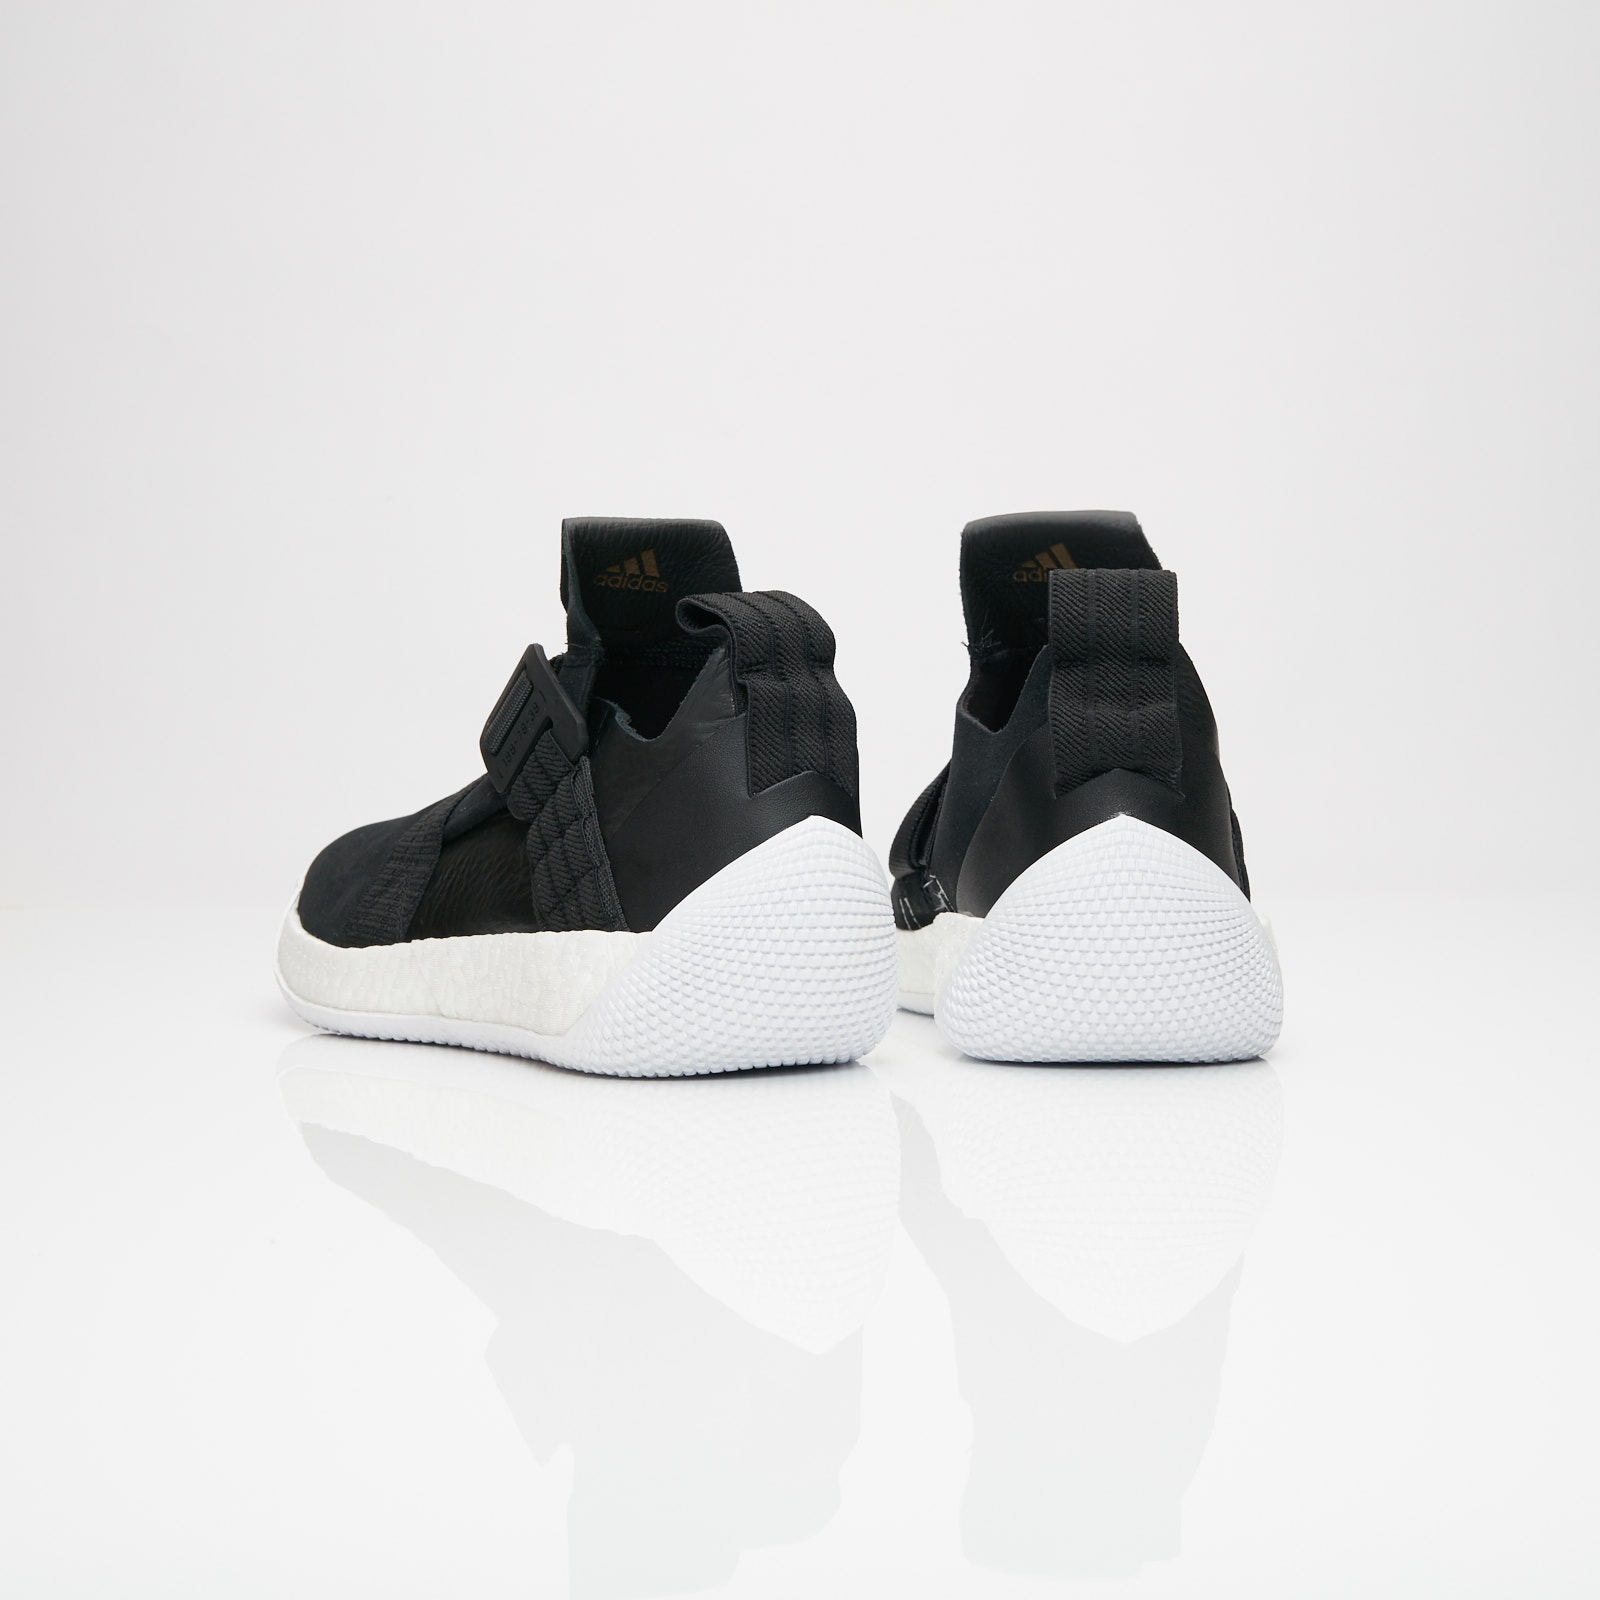 833b5e6db7f adidas Harden LS 2 Buckle - Ac7435 - Sneakersnstuff